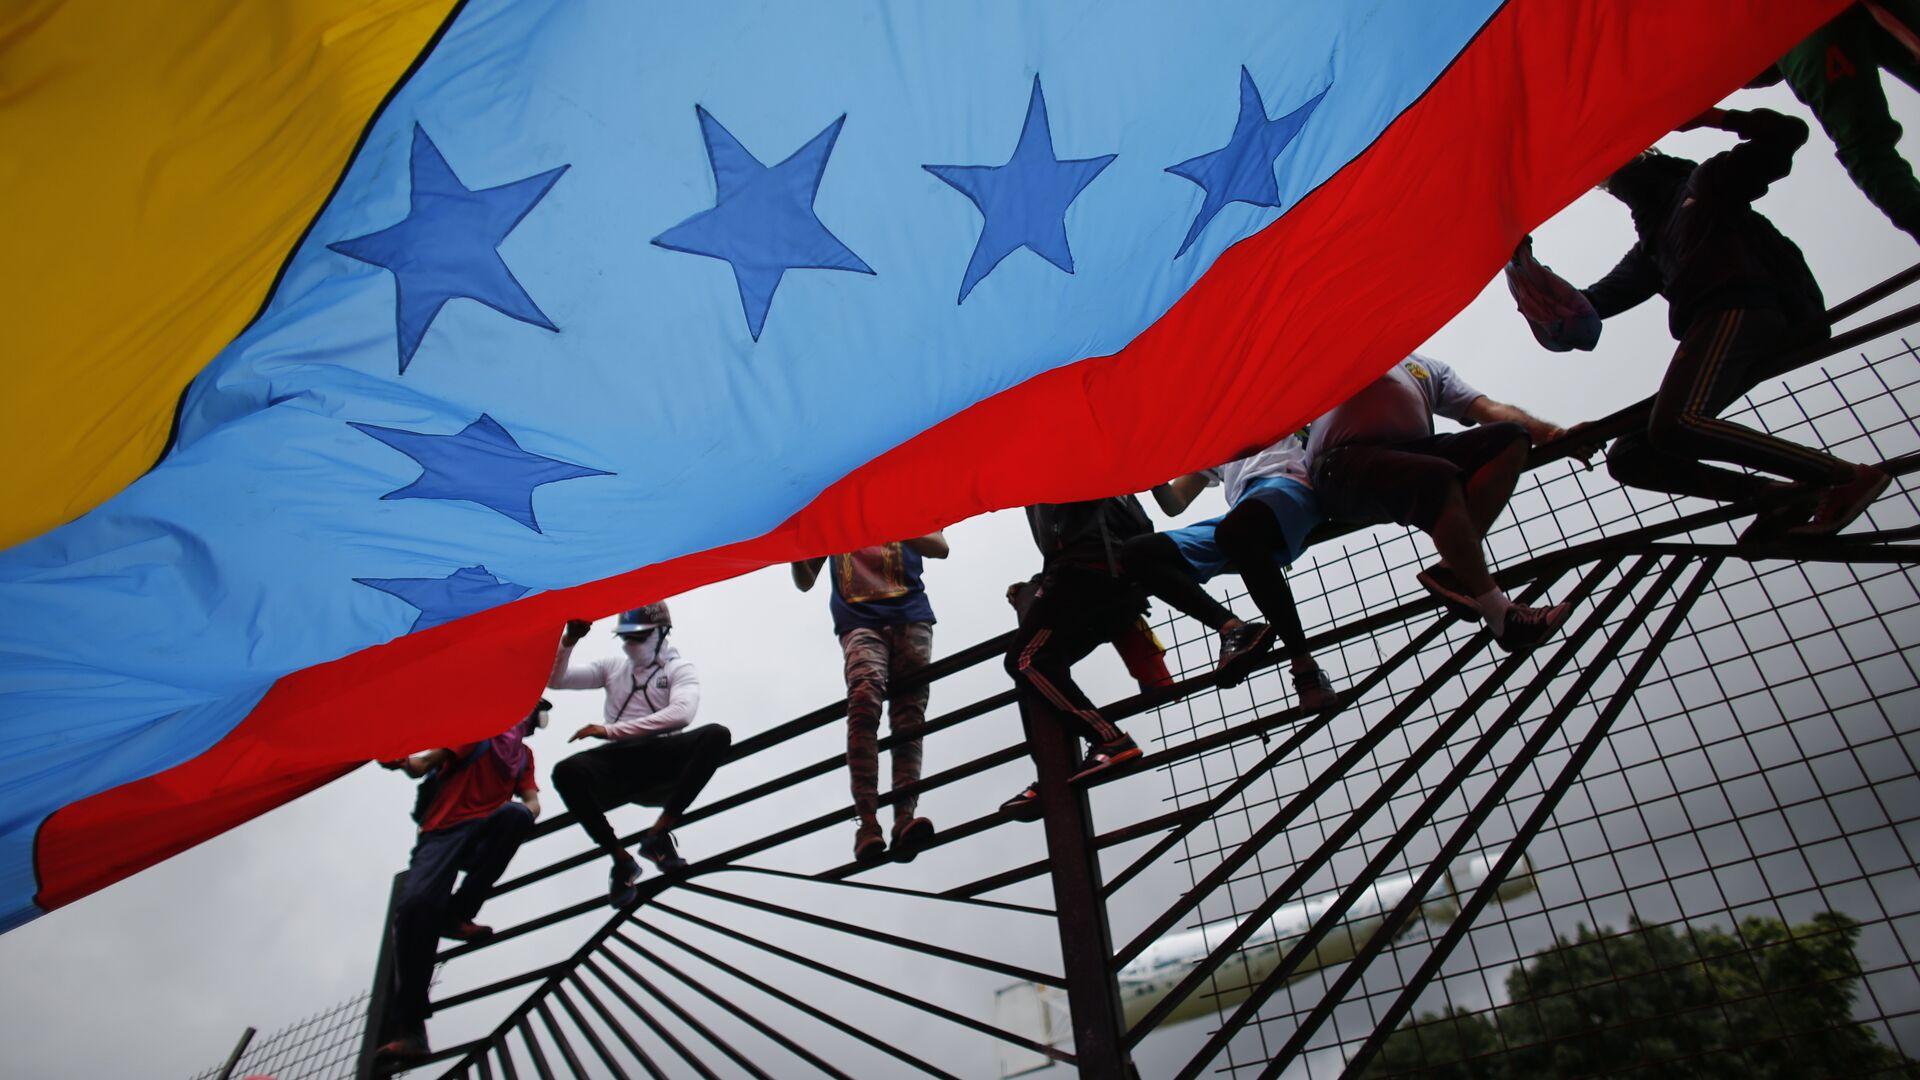 Bandera de Venezuela - Sputnik Mundo, 1920, 11.05.2021